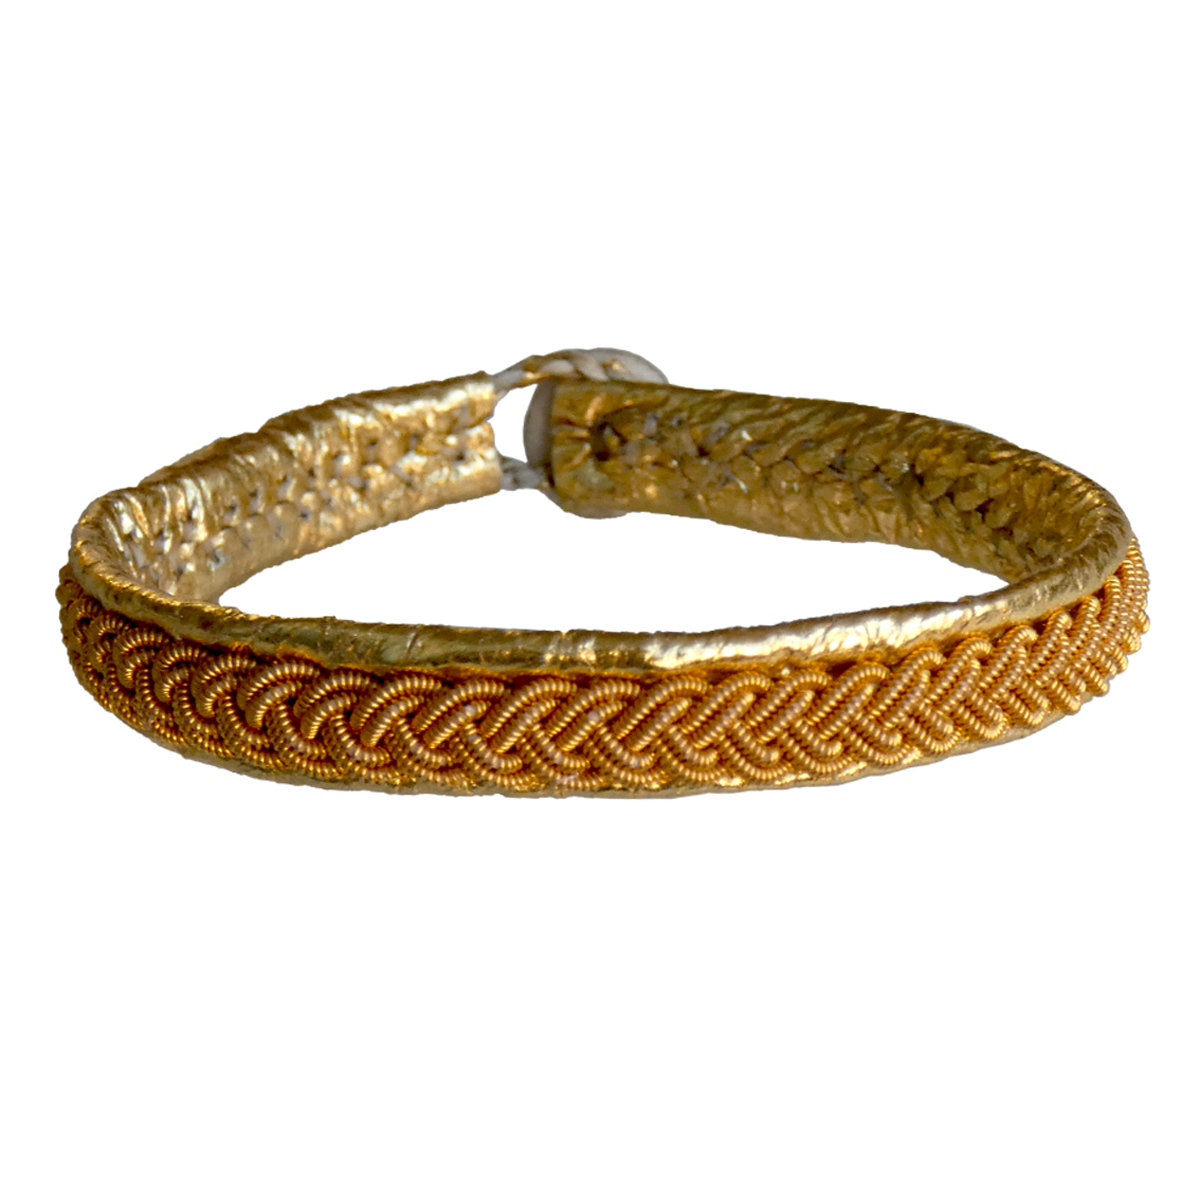 Empreinte Nomade, bracelet Lapon Anja Coloris Or tresse Or - cassisroyal.com